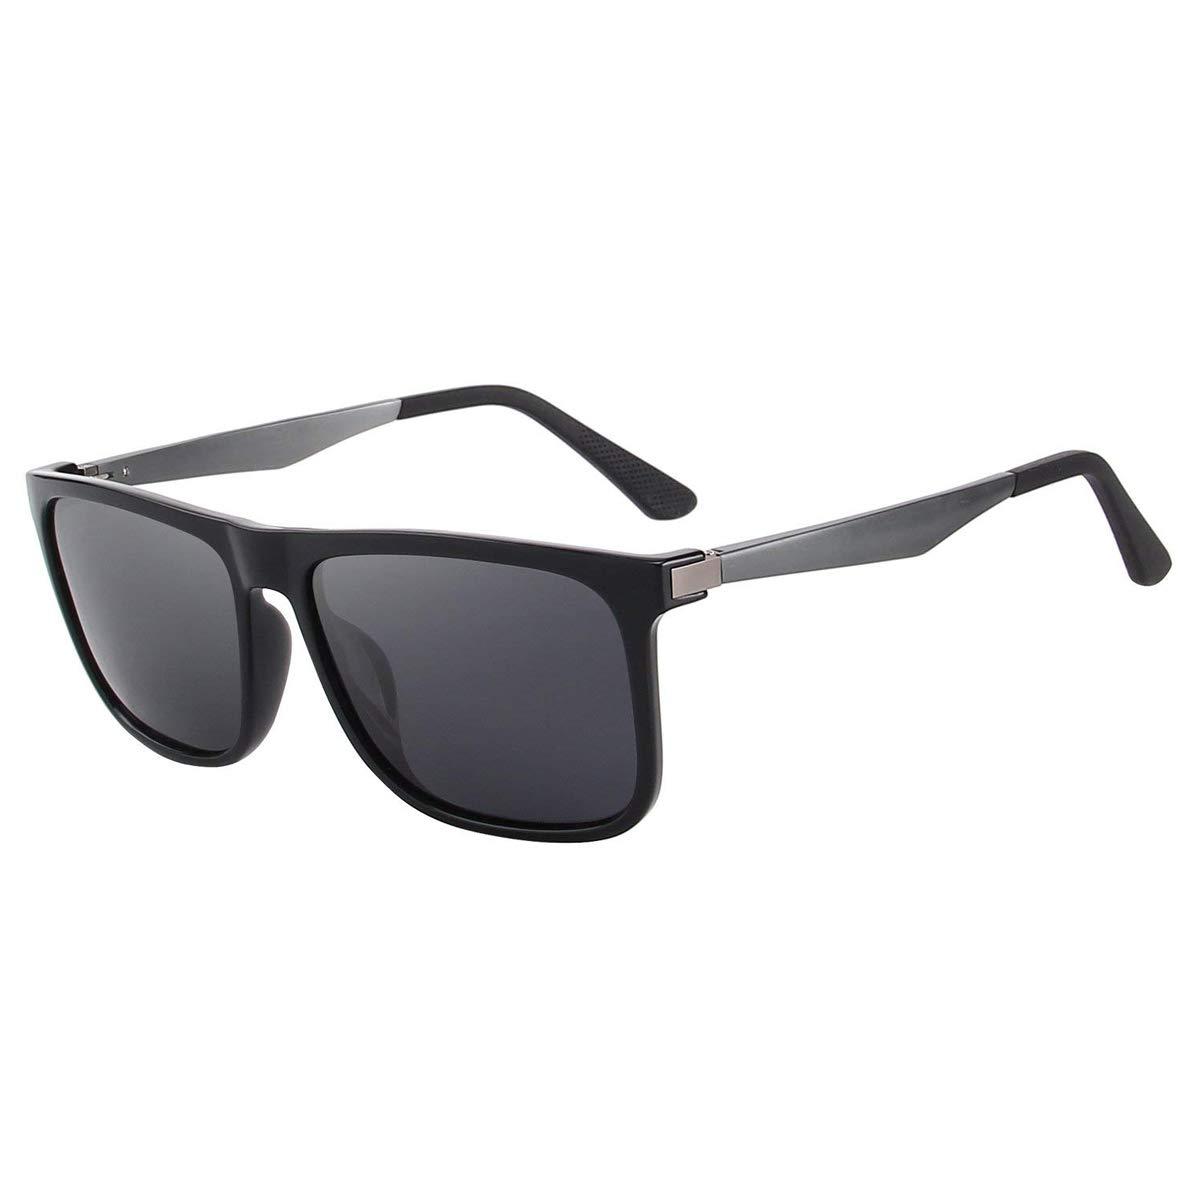 04bb2094c1 CHEREEKI Gafas de sol Hombre Mujer Polarizadas UV400 Protection Clásico  Retro Gafas product image